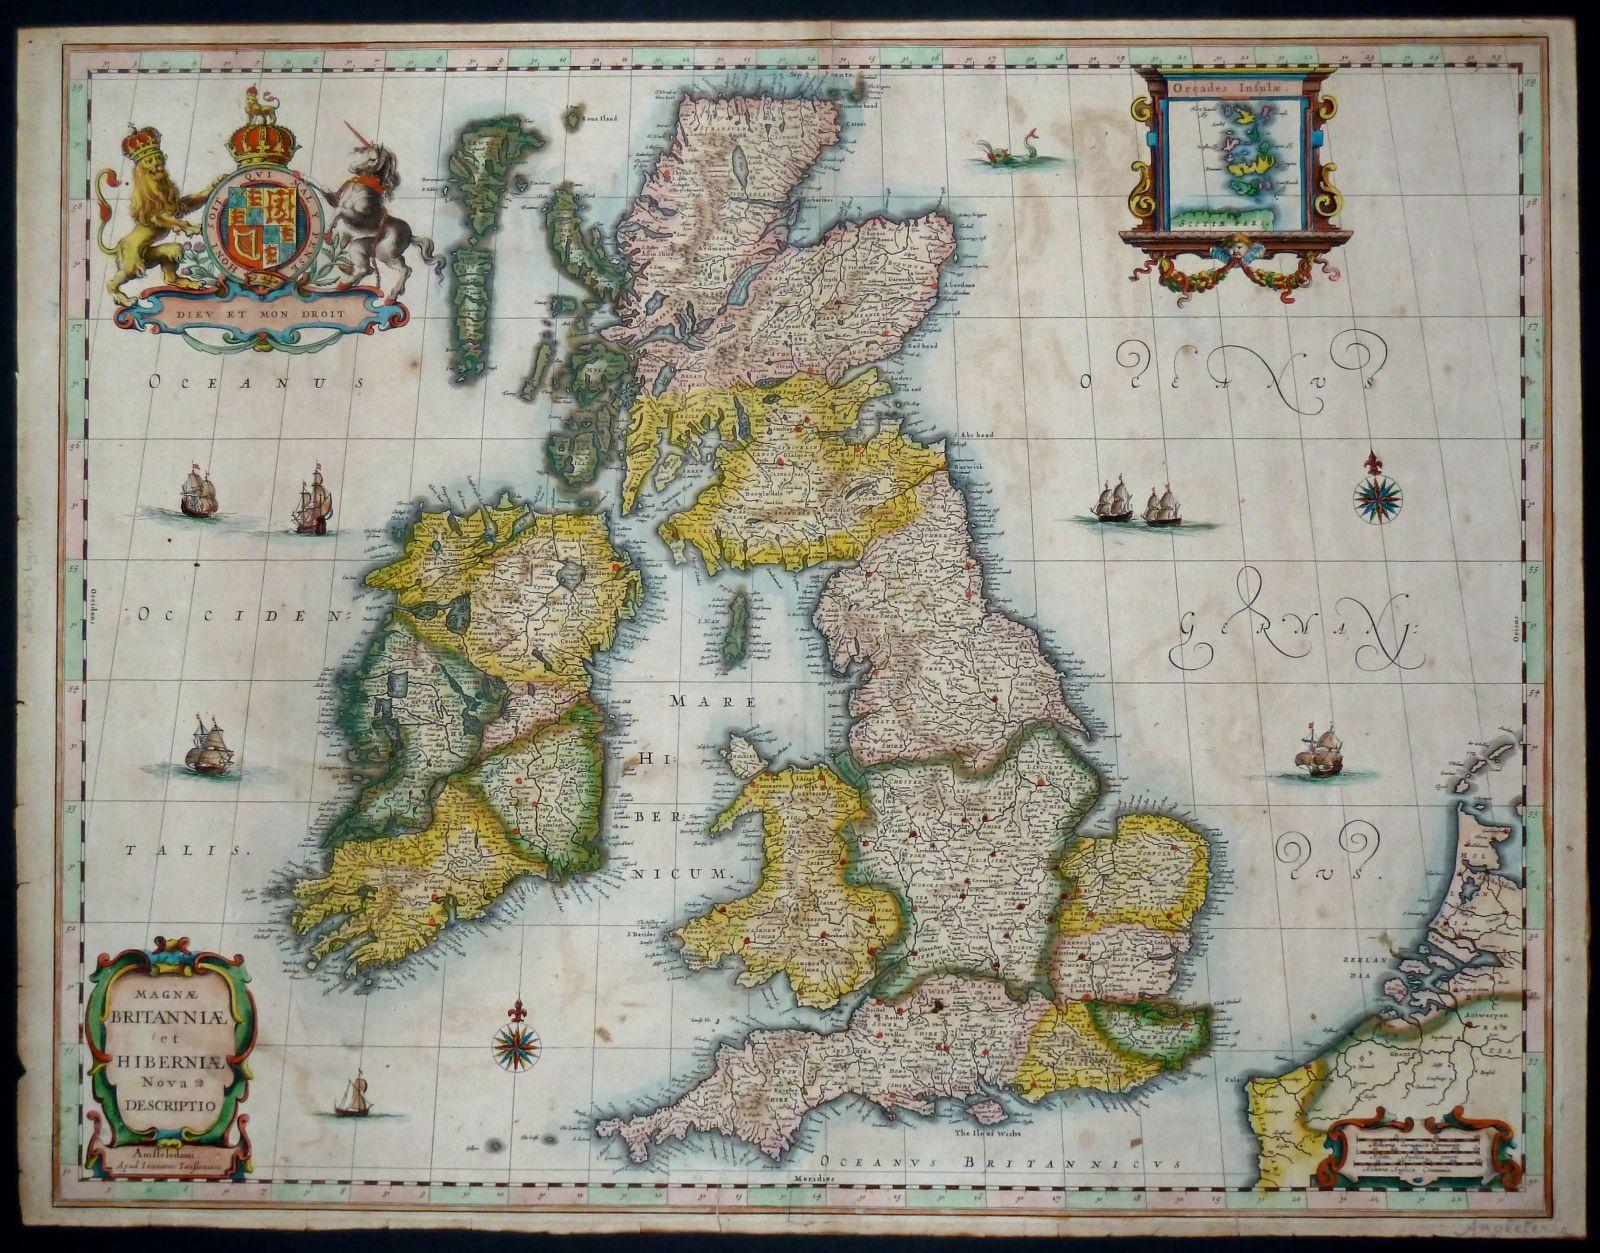 Whole Of Britain, Antique Maps, Old Maps, Vintage Maps ...